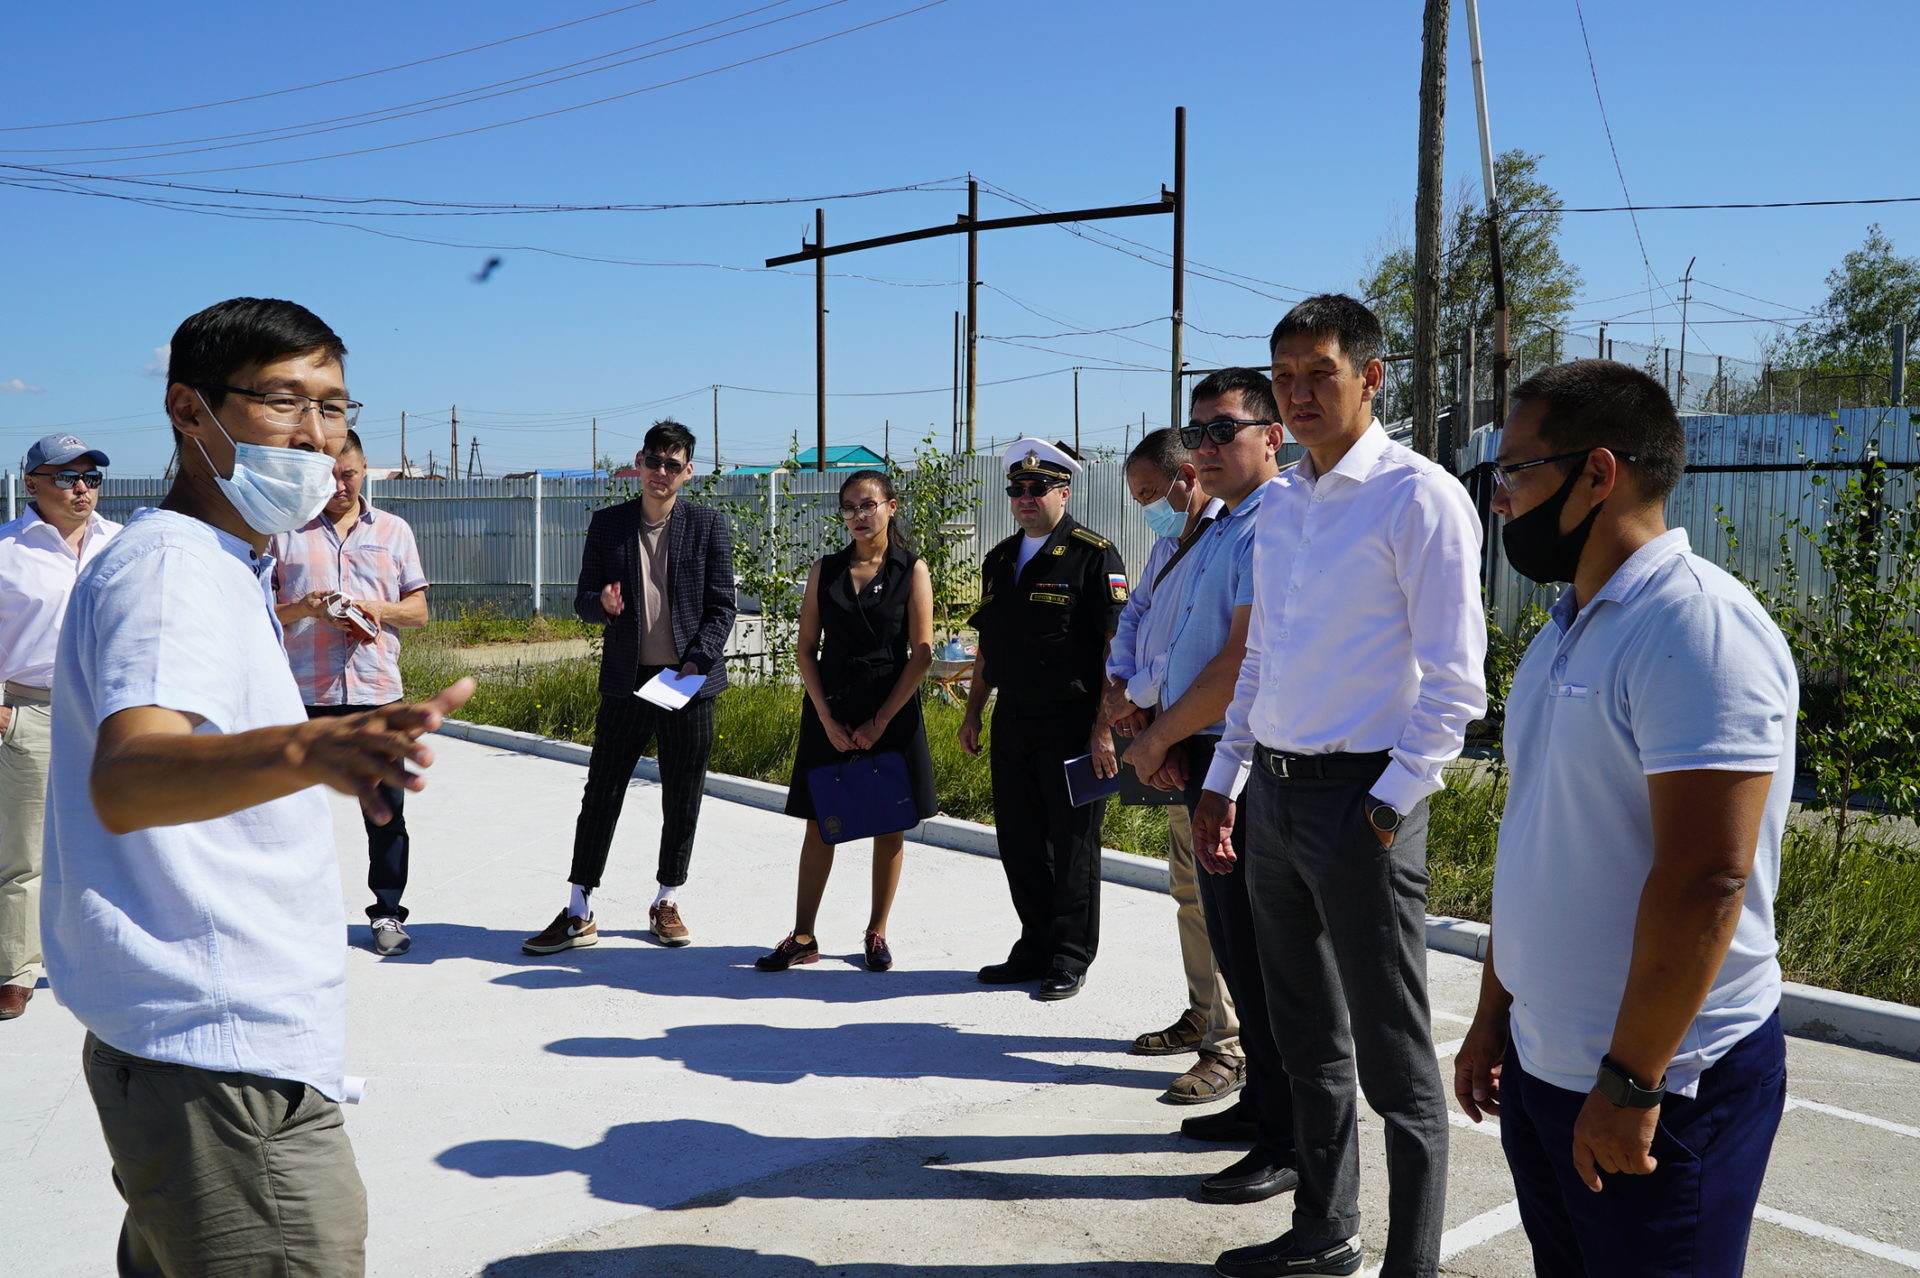 Михаил Сивцев провел совещание по организации учебно-методического центра «Авангард» в Республике Саха (Якутия)